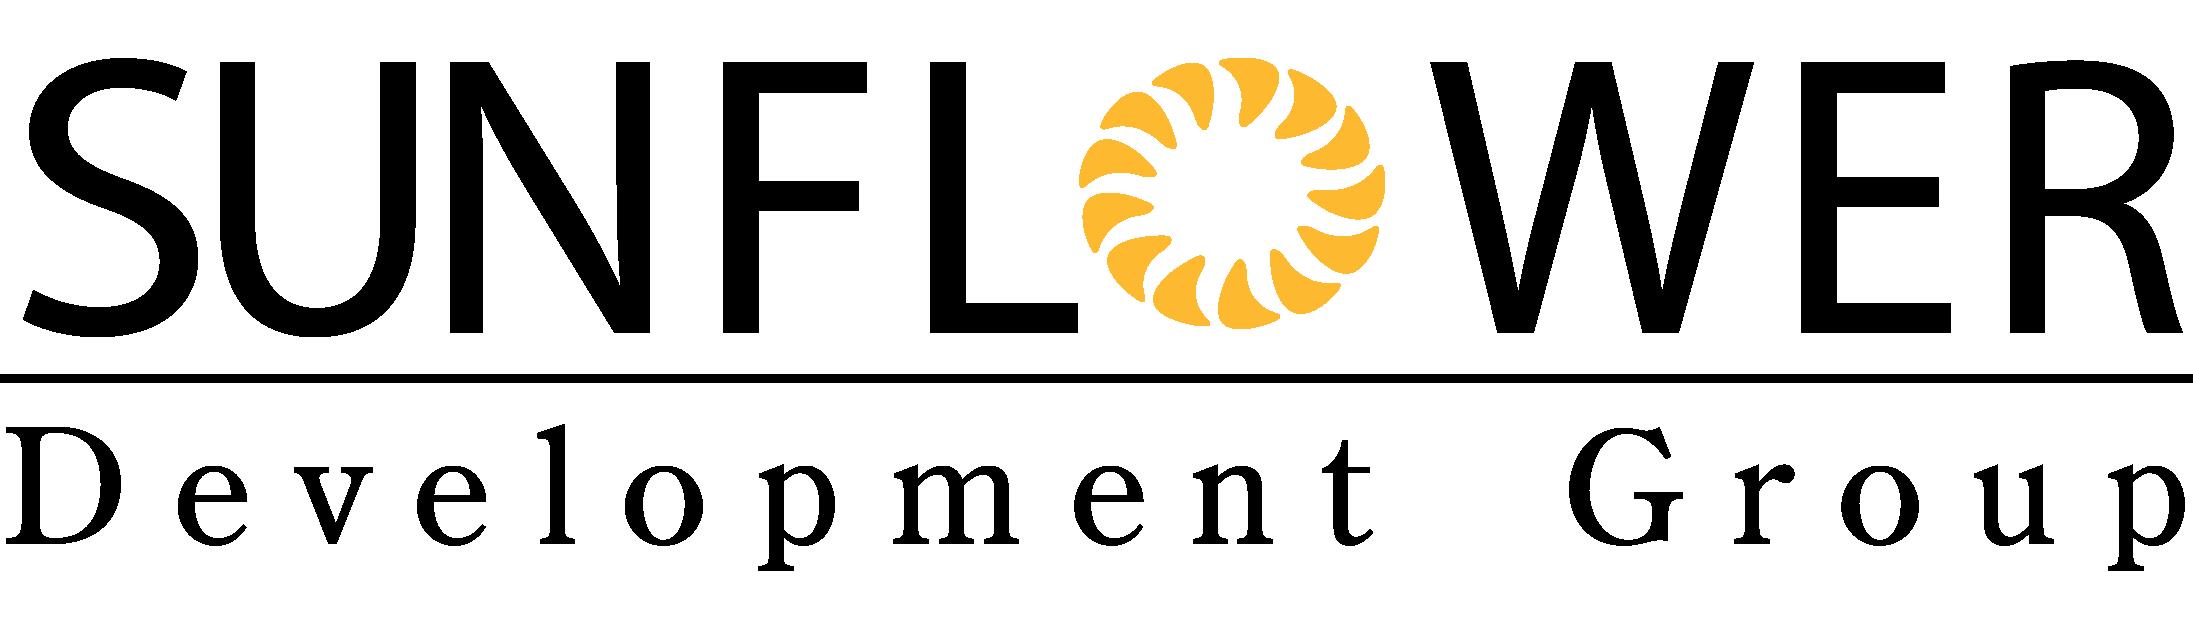 Sunflower-Logo-Black copy.png